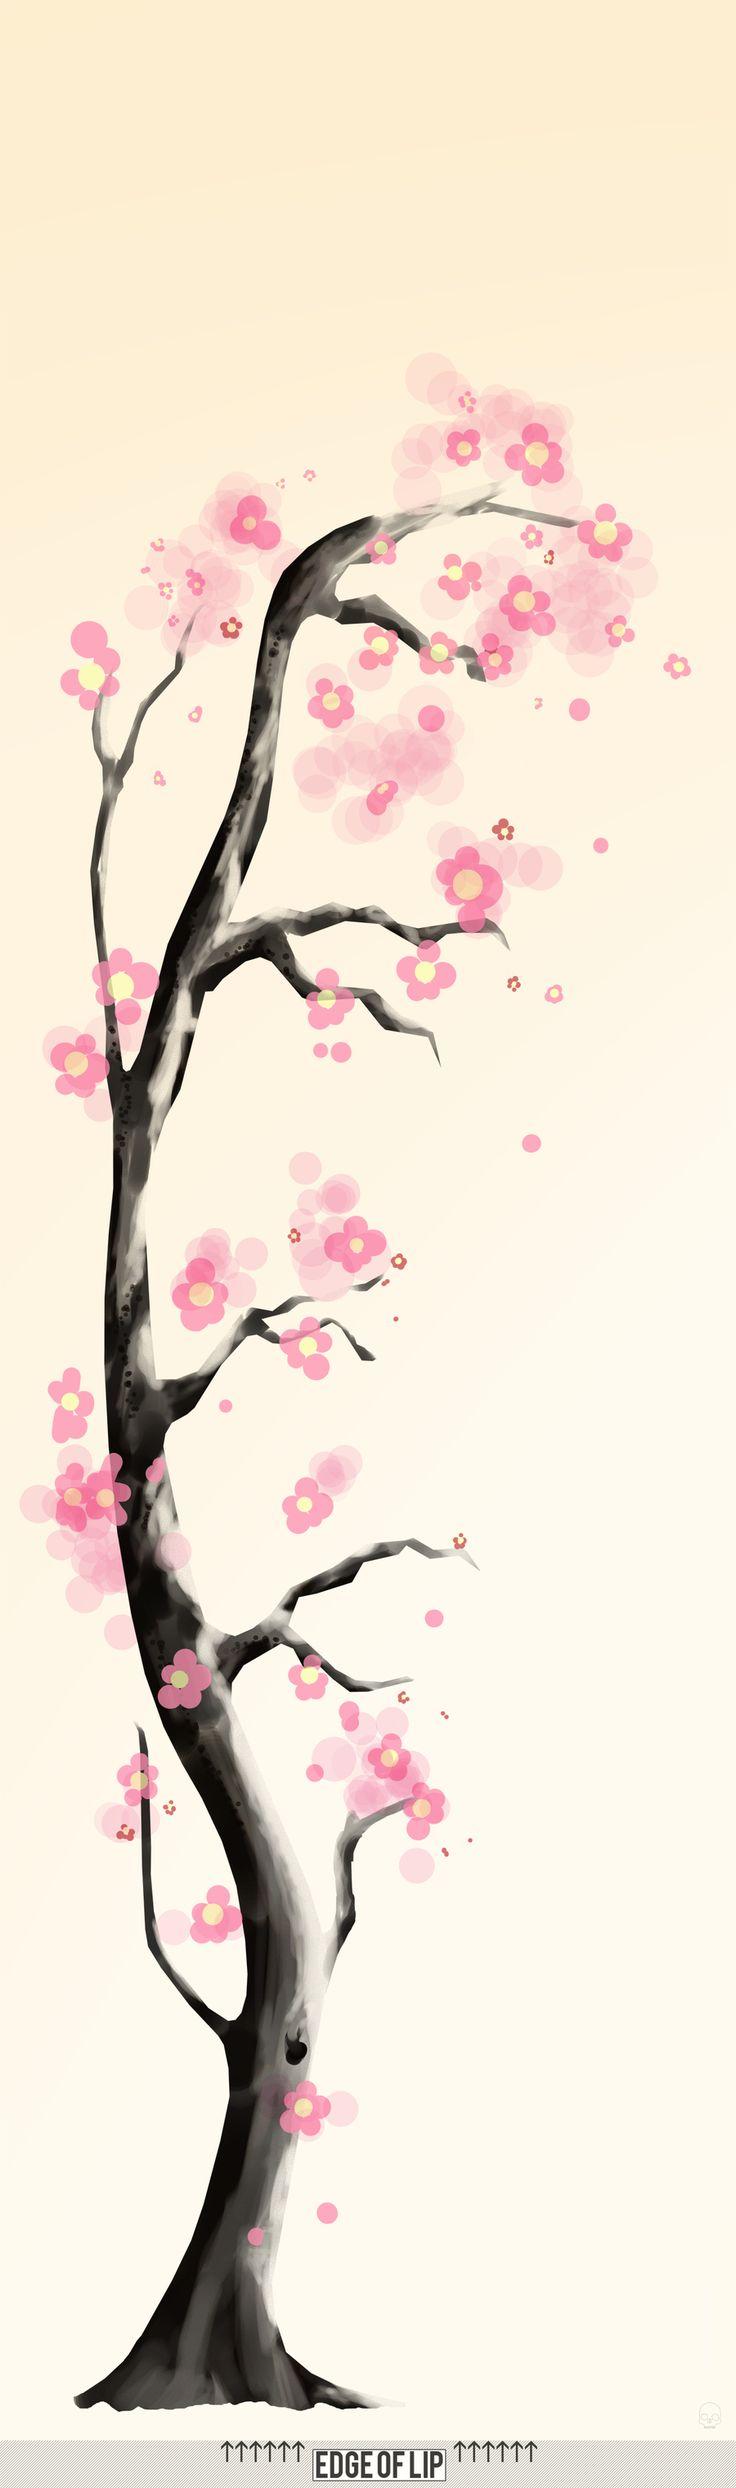 Drawn sakura blossom cute Pinterest The images on 100